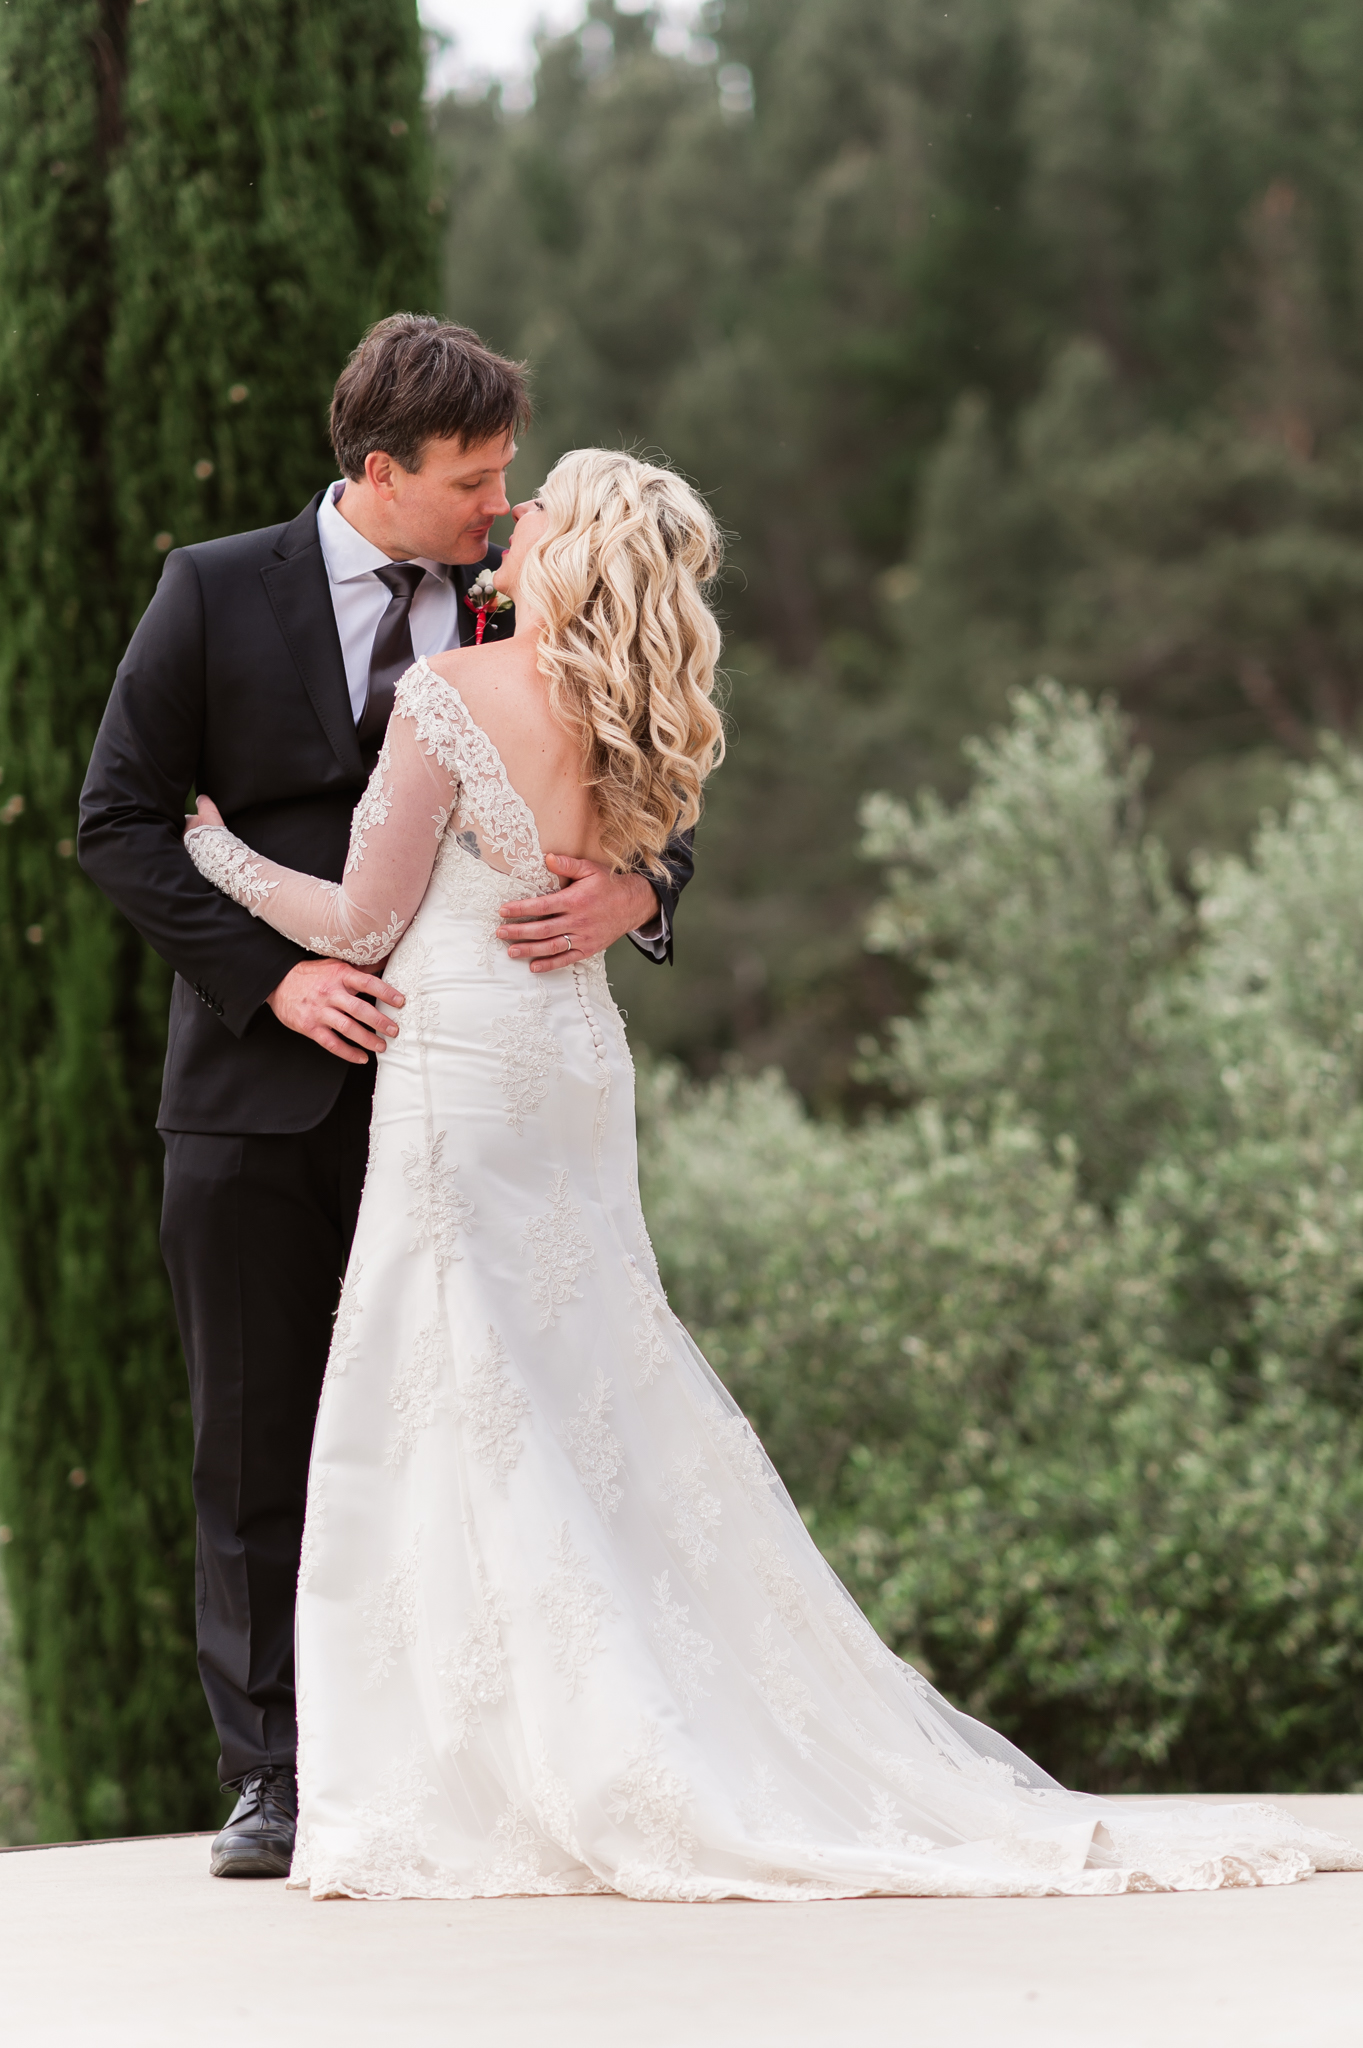 Angelique_Smith_Photography_Pieter&Yvonne_Wedding-463.jpg